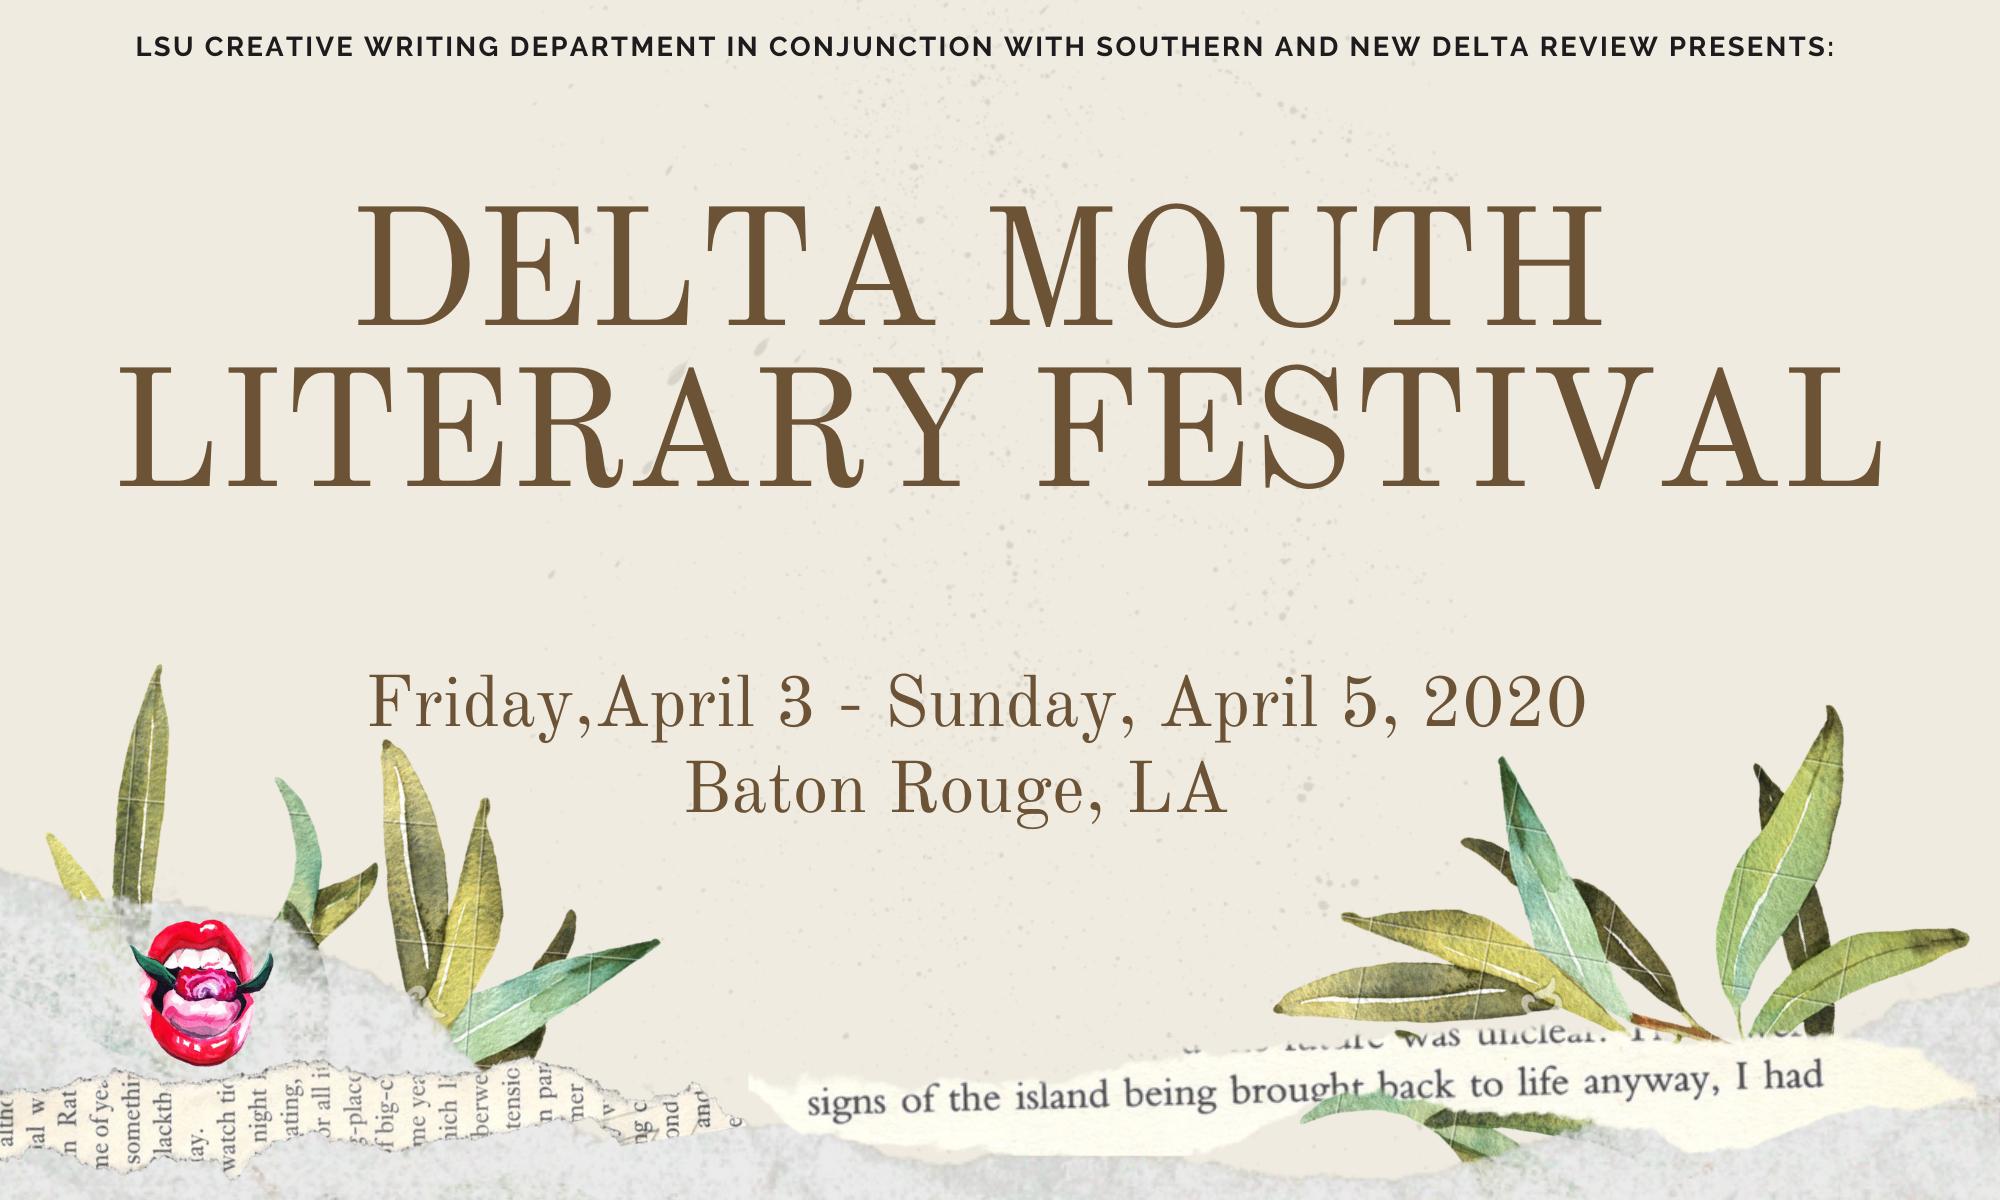 Delta Mouth Literary Festival